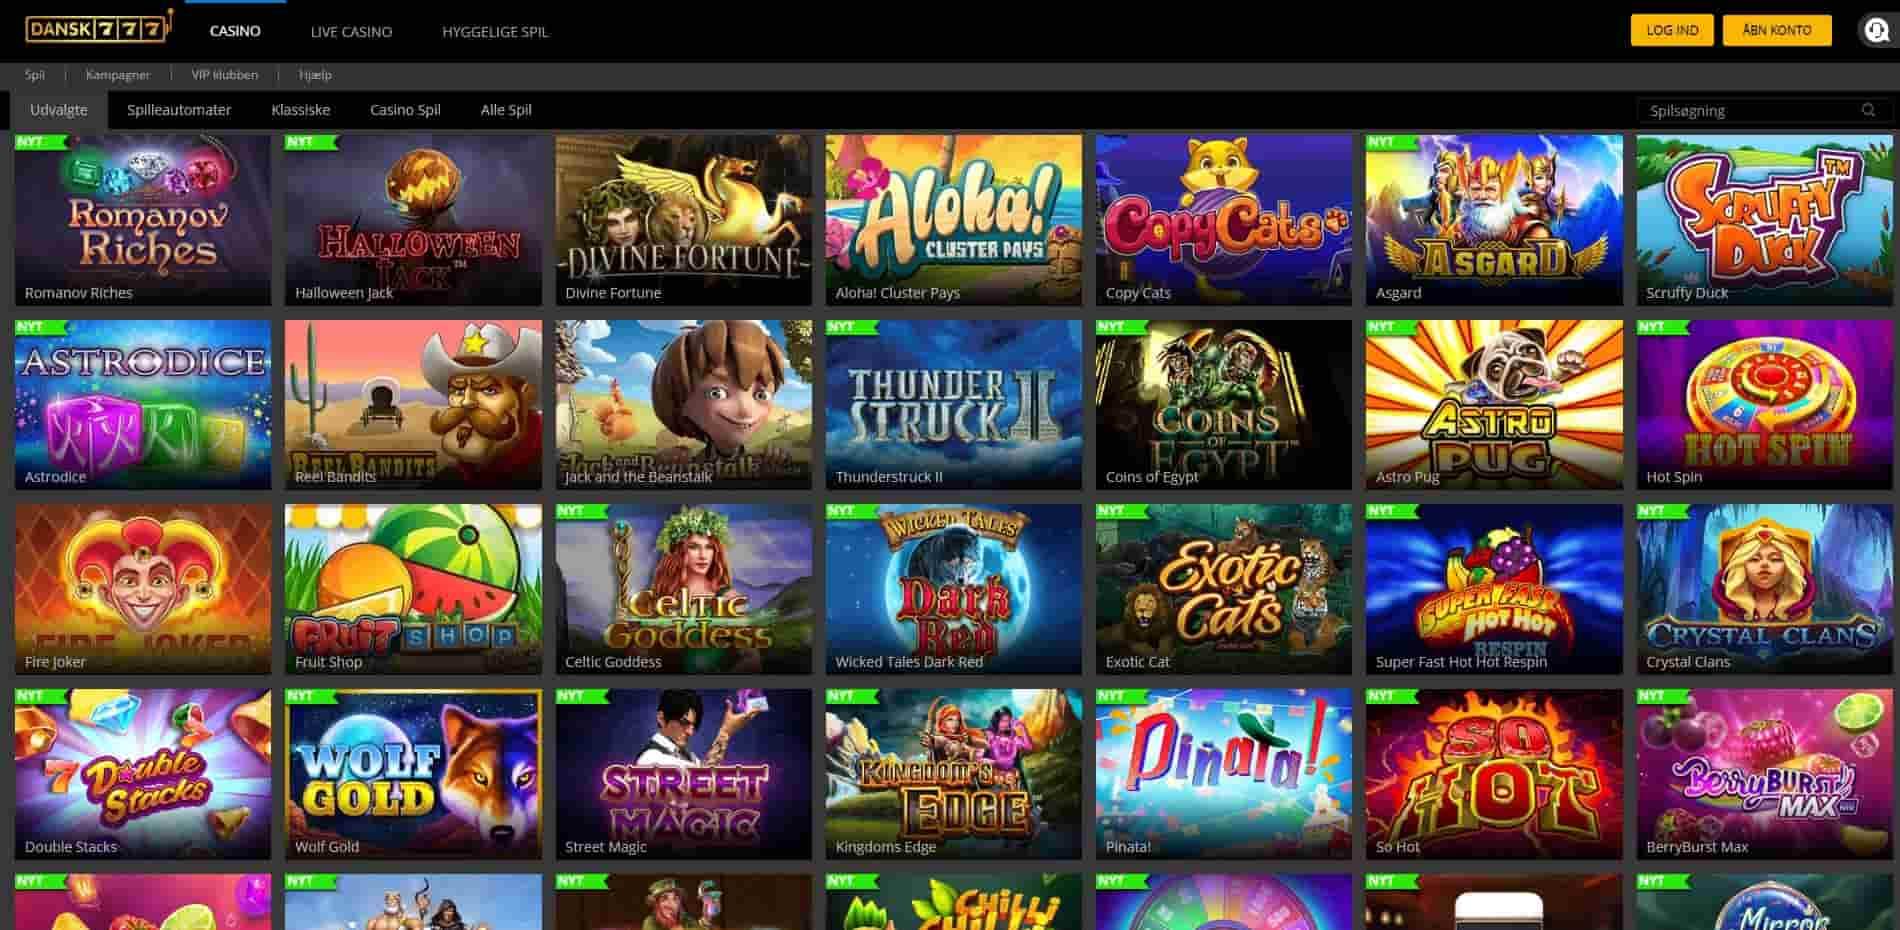 Dansk777 Casino Games